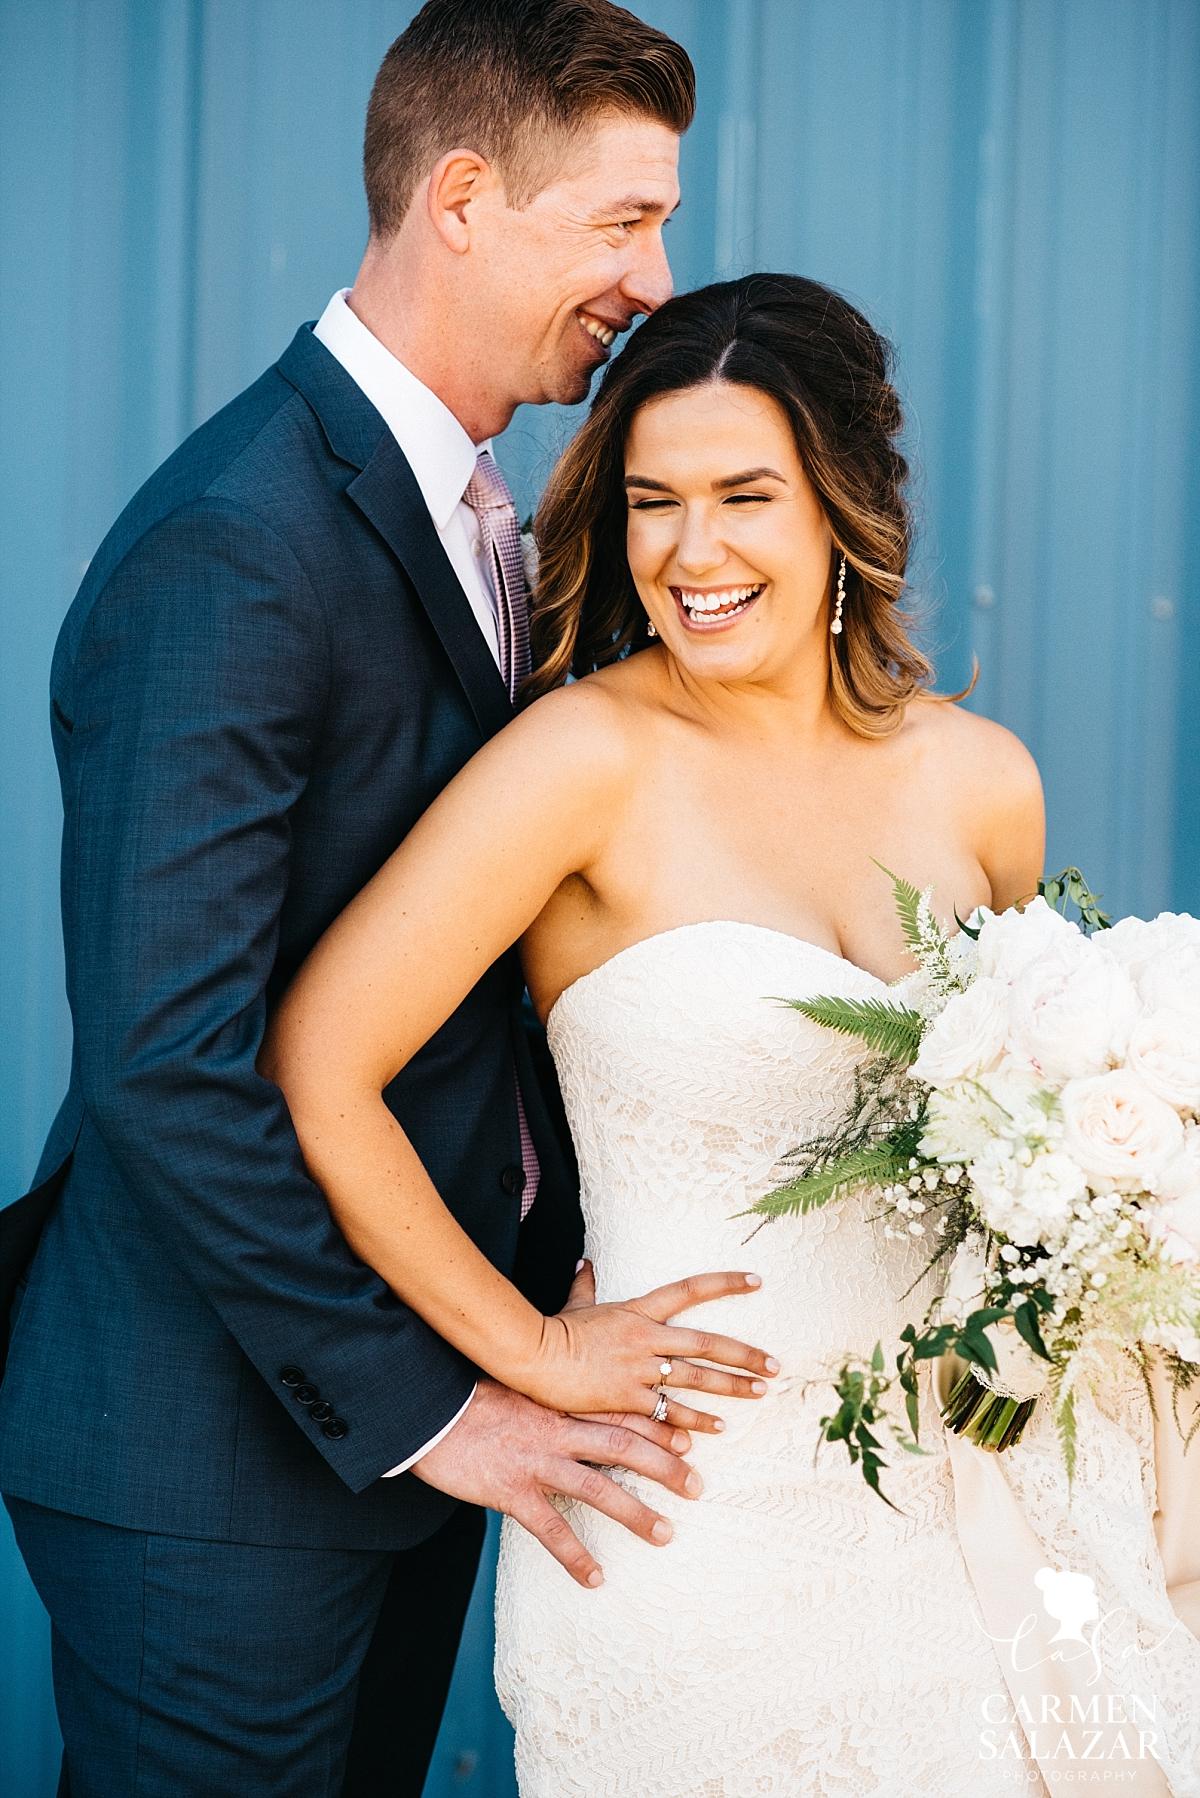 Joyful bride and groom wedding portraits - Carmen Salazar